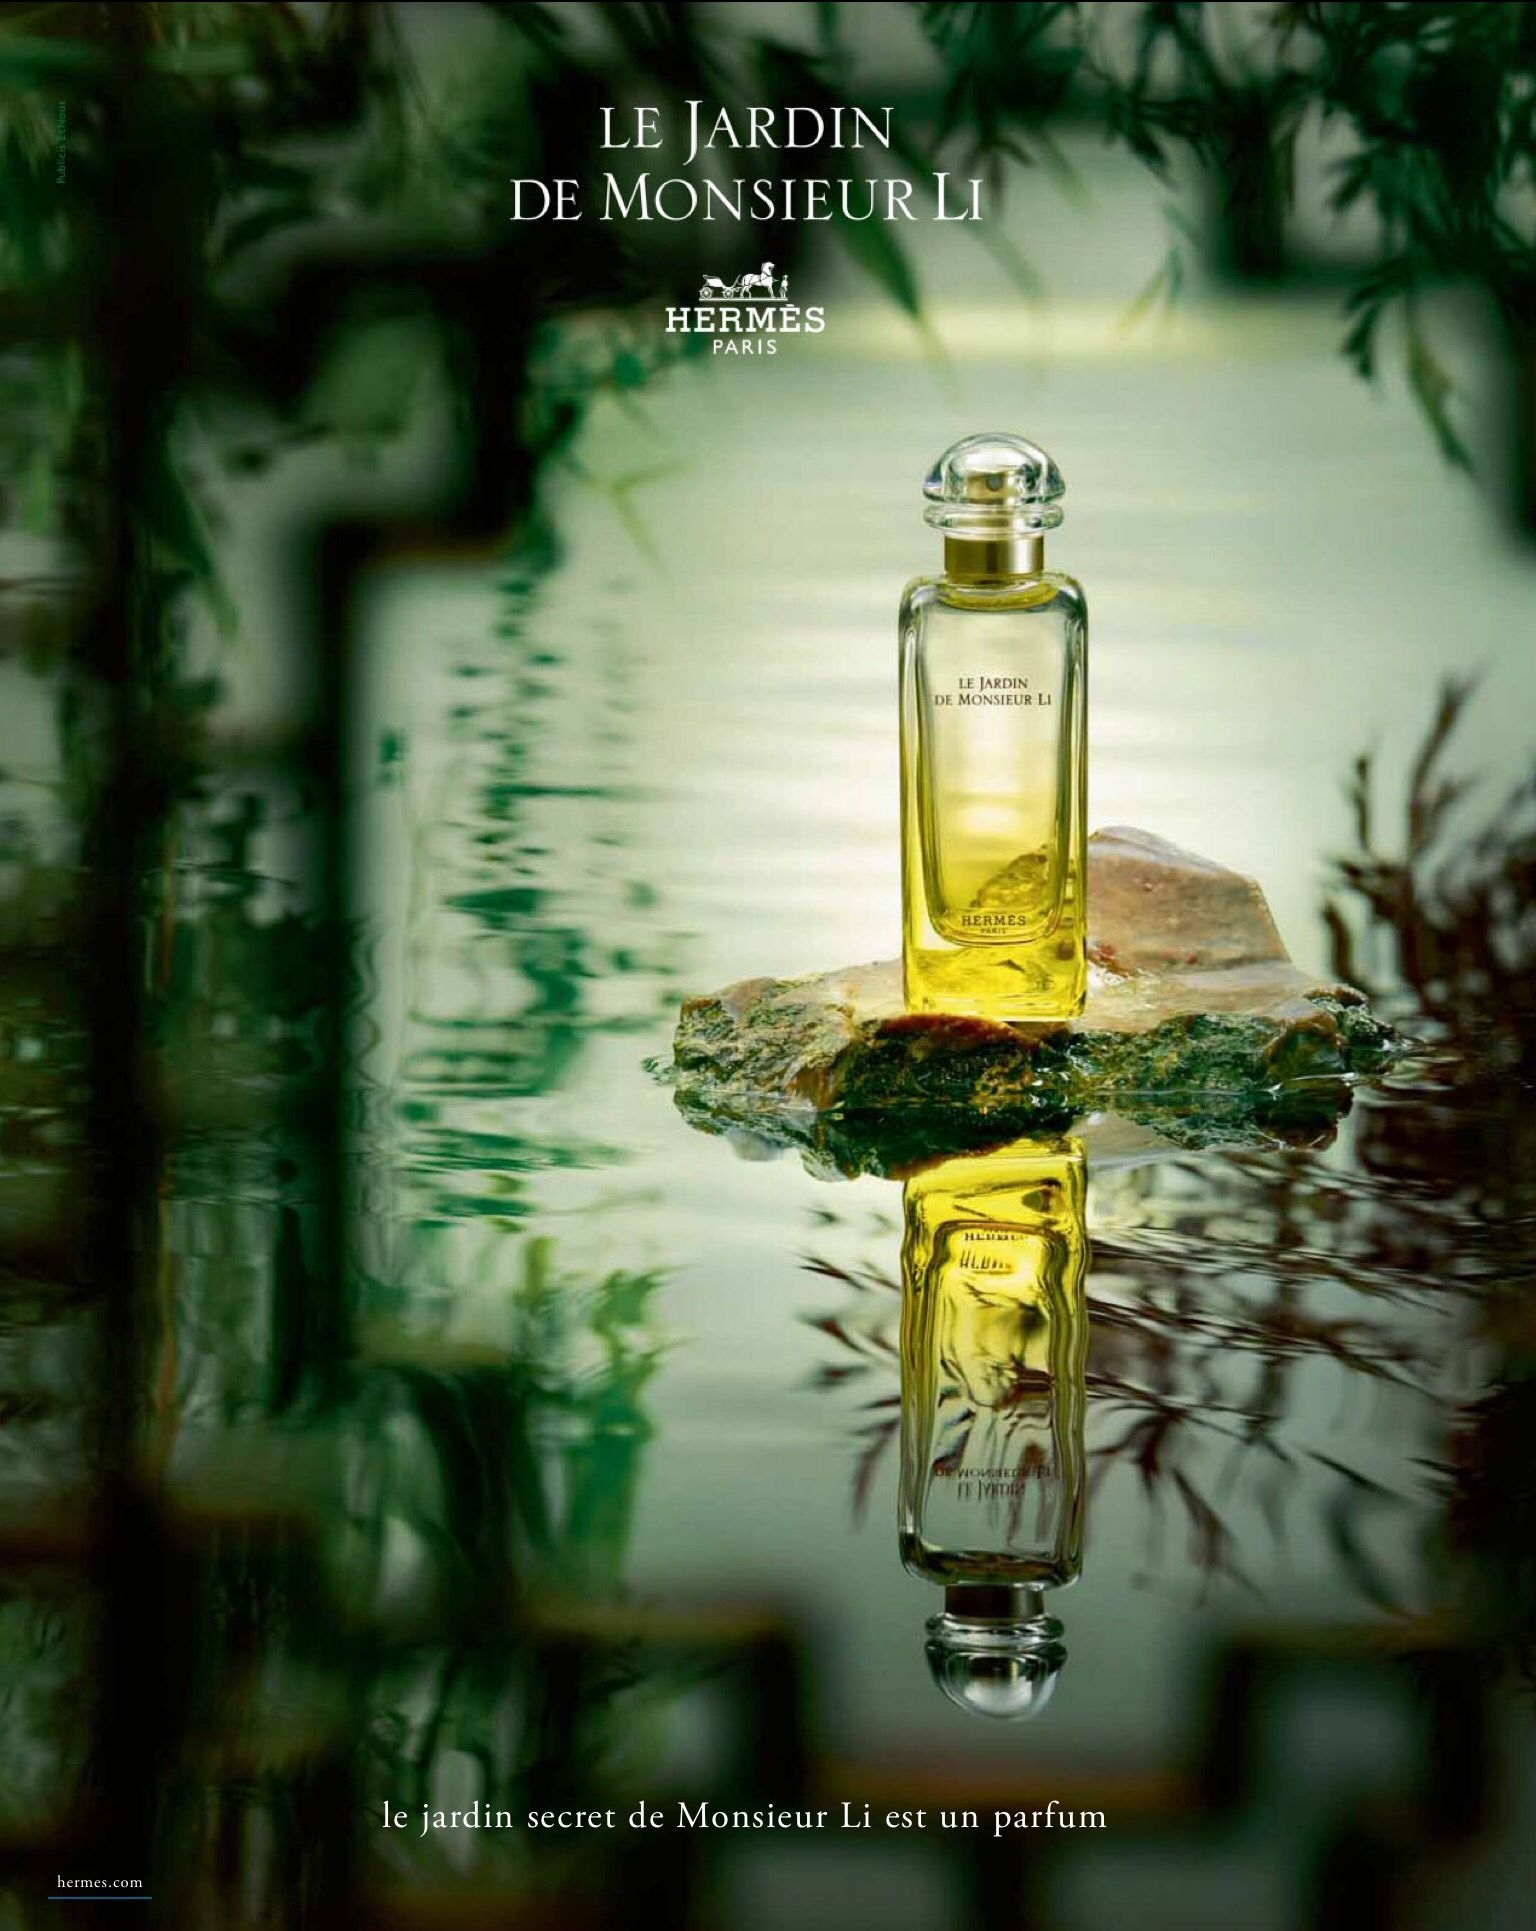 Fragrance AdvertisingPerfume Le Monsieur Jardin Hermes De Li A3jLq54R